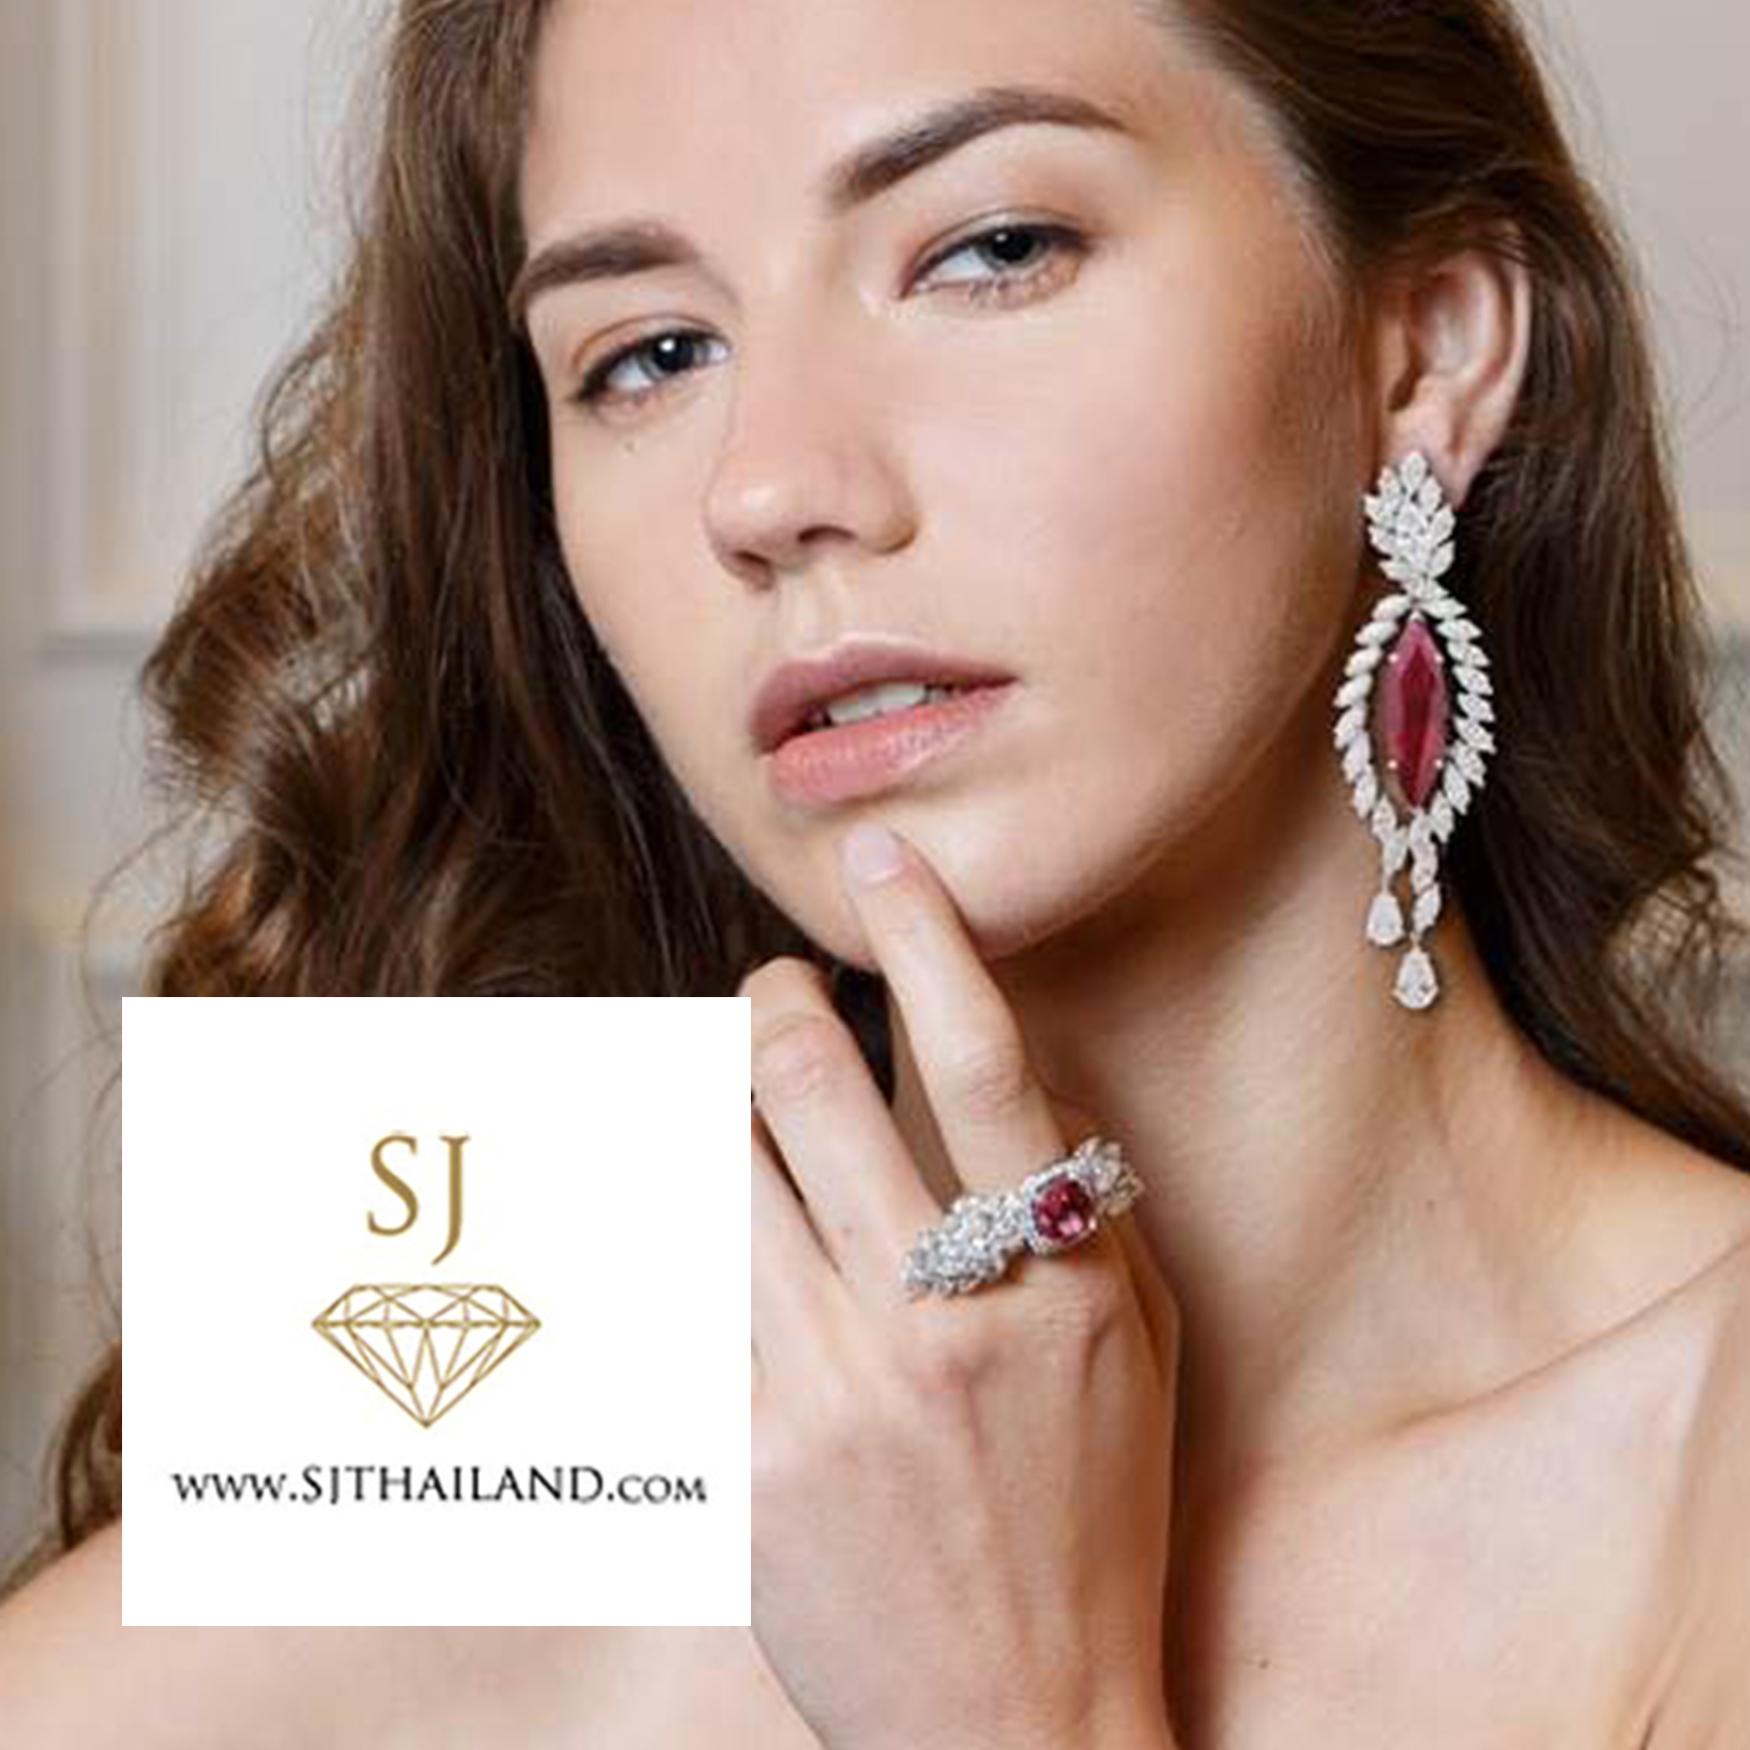 SJ International